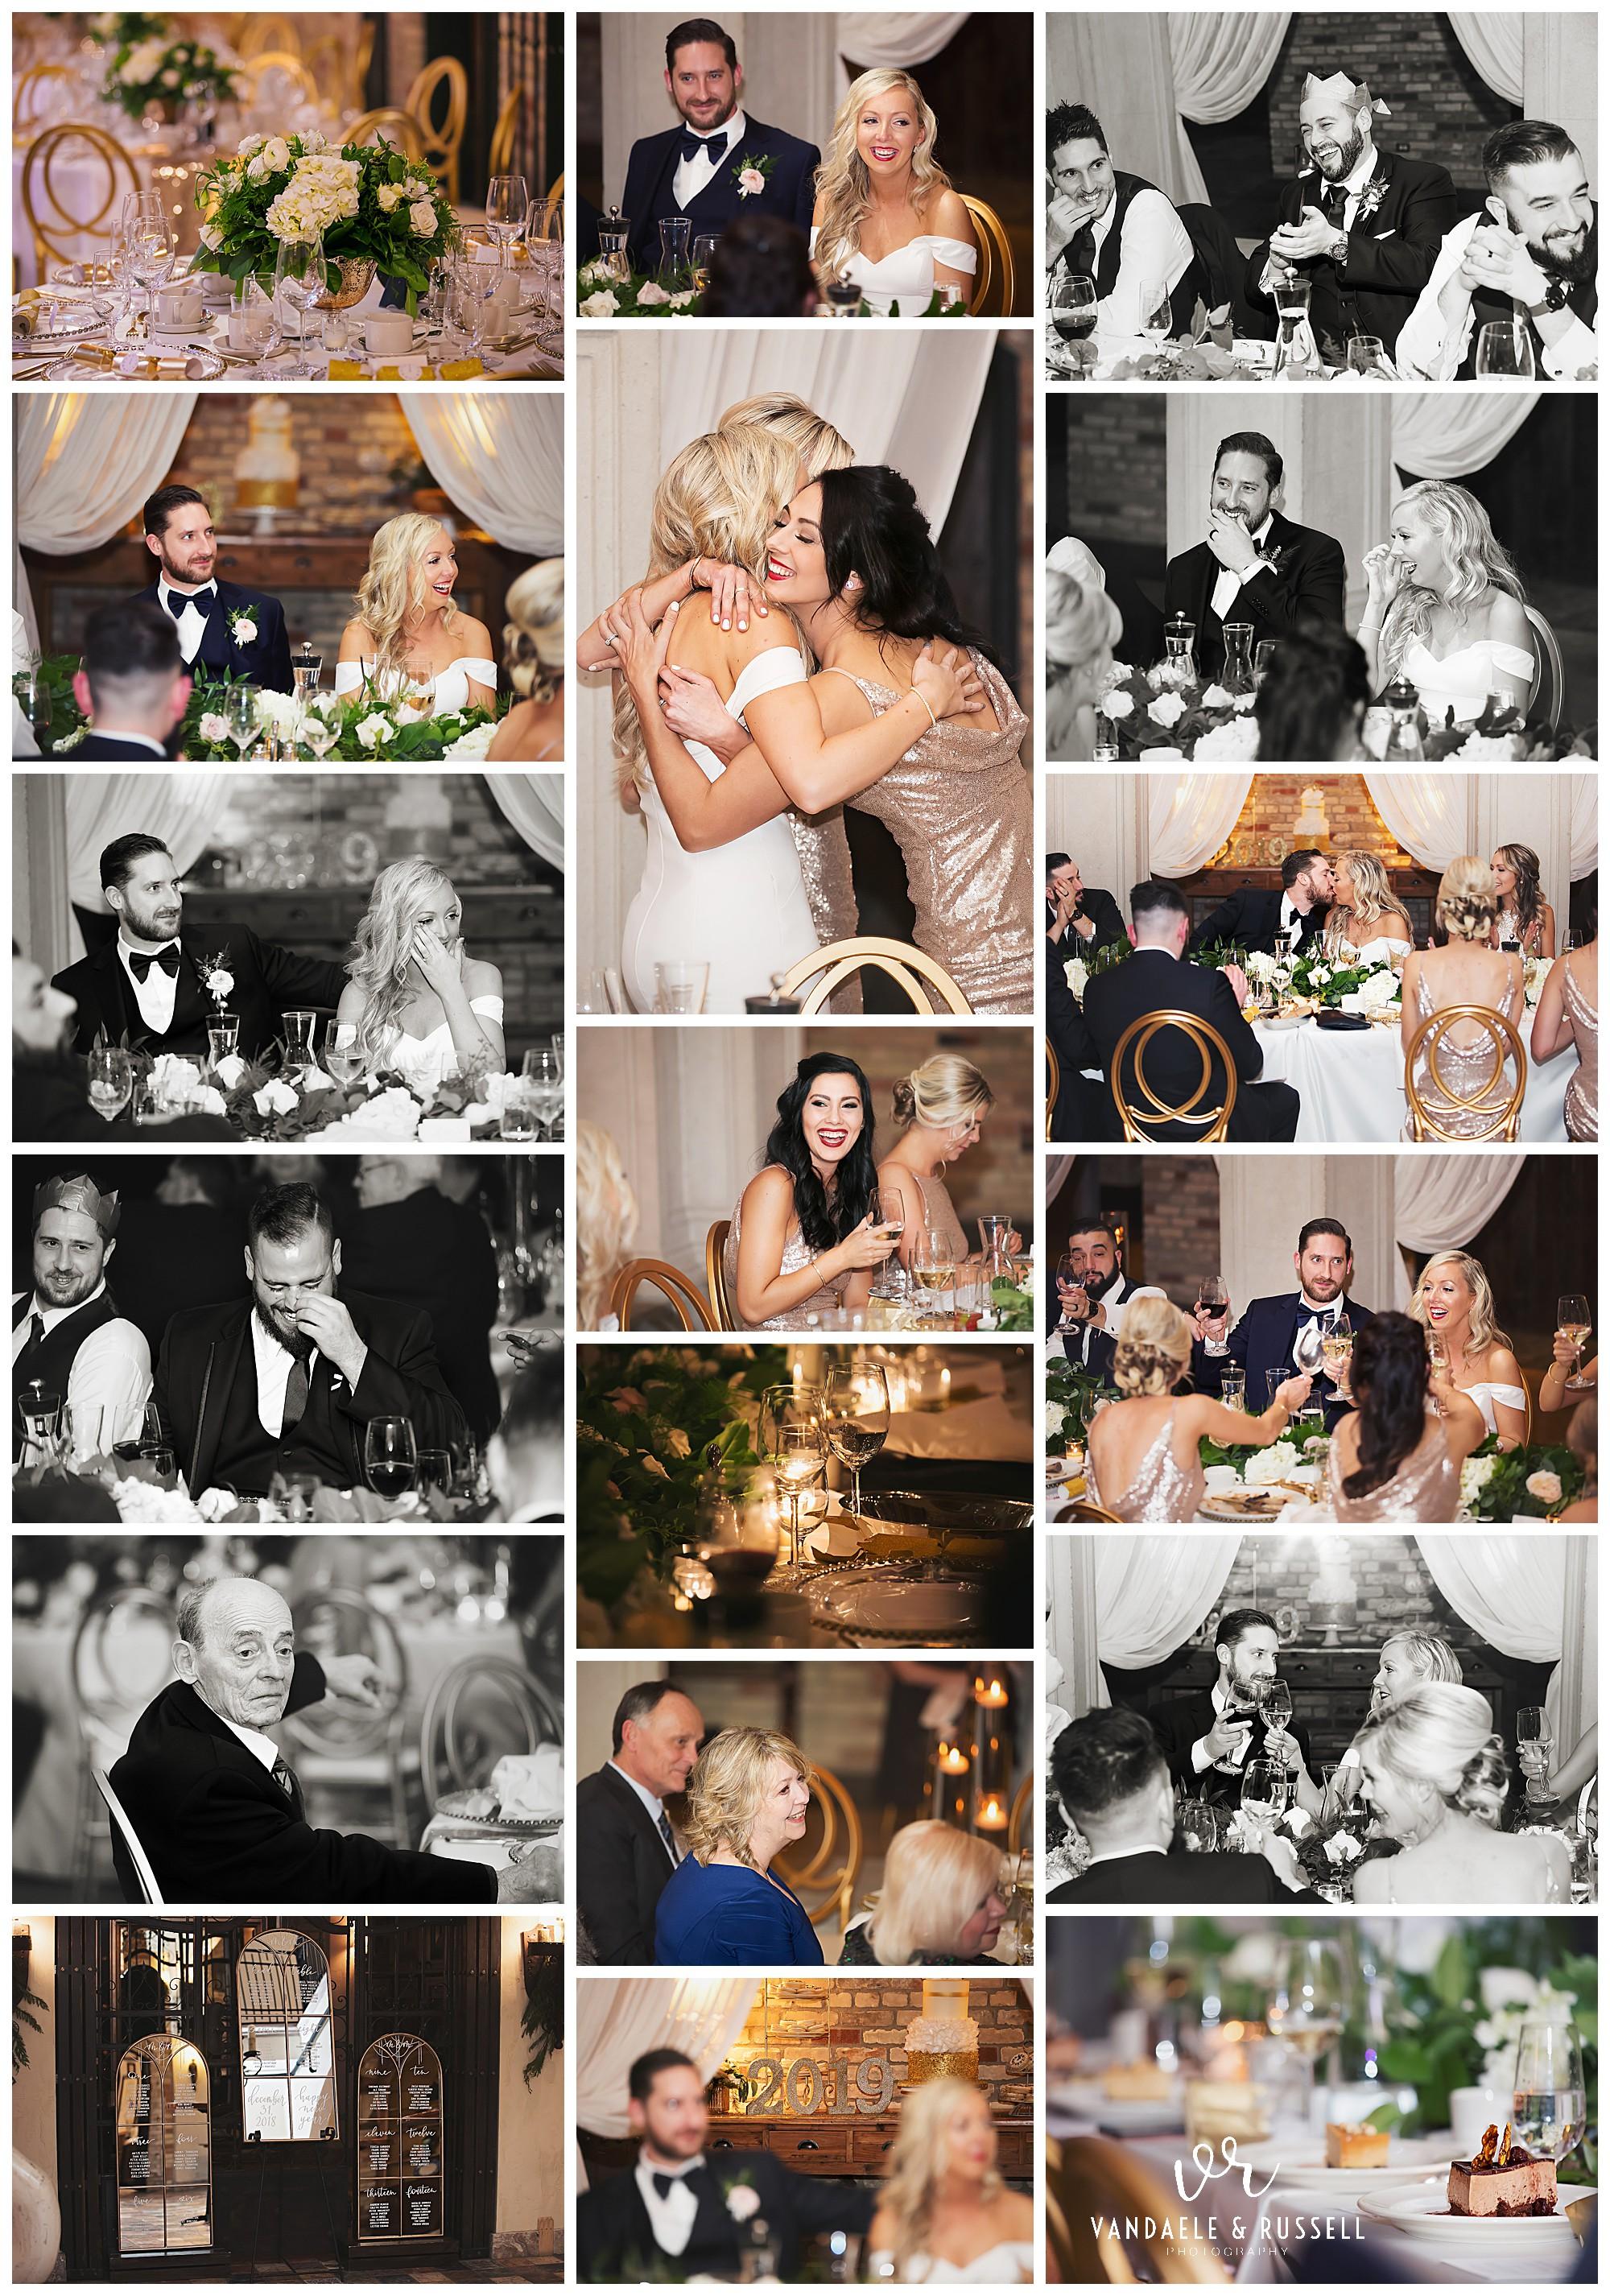 Hacienda-Sarria-Wedding-Photos-NYE-Michelle-Matt-VanDaele-Russell_0041.jpg